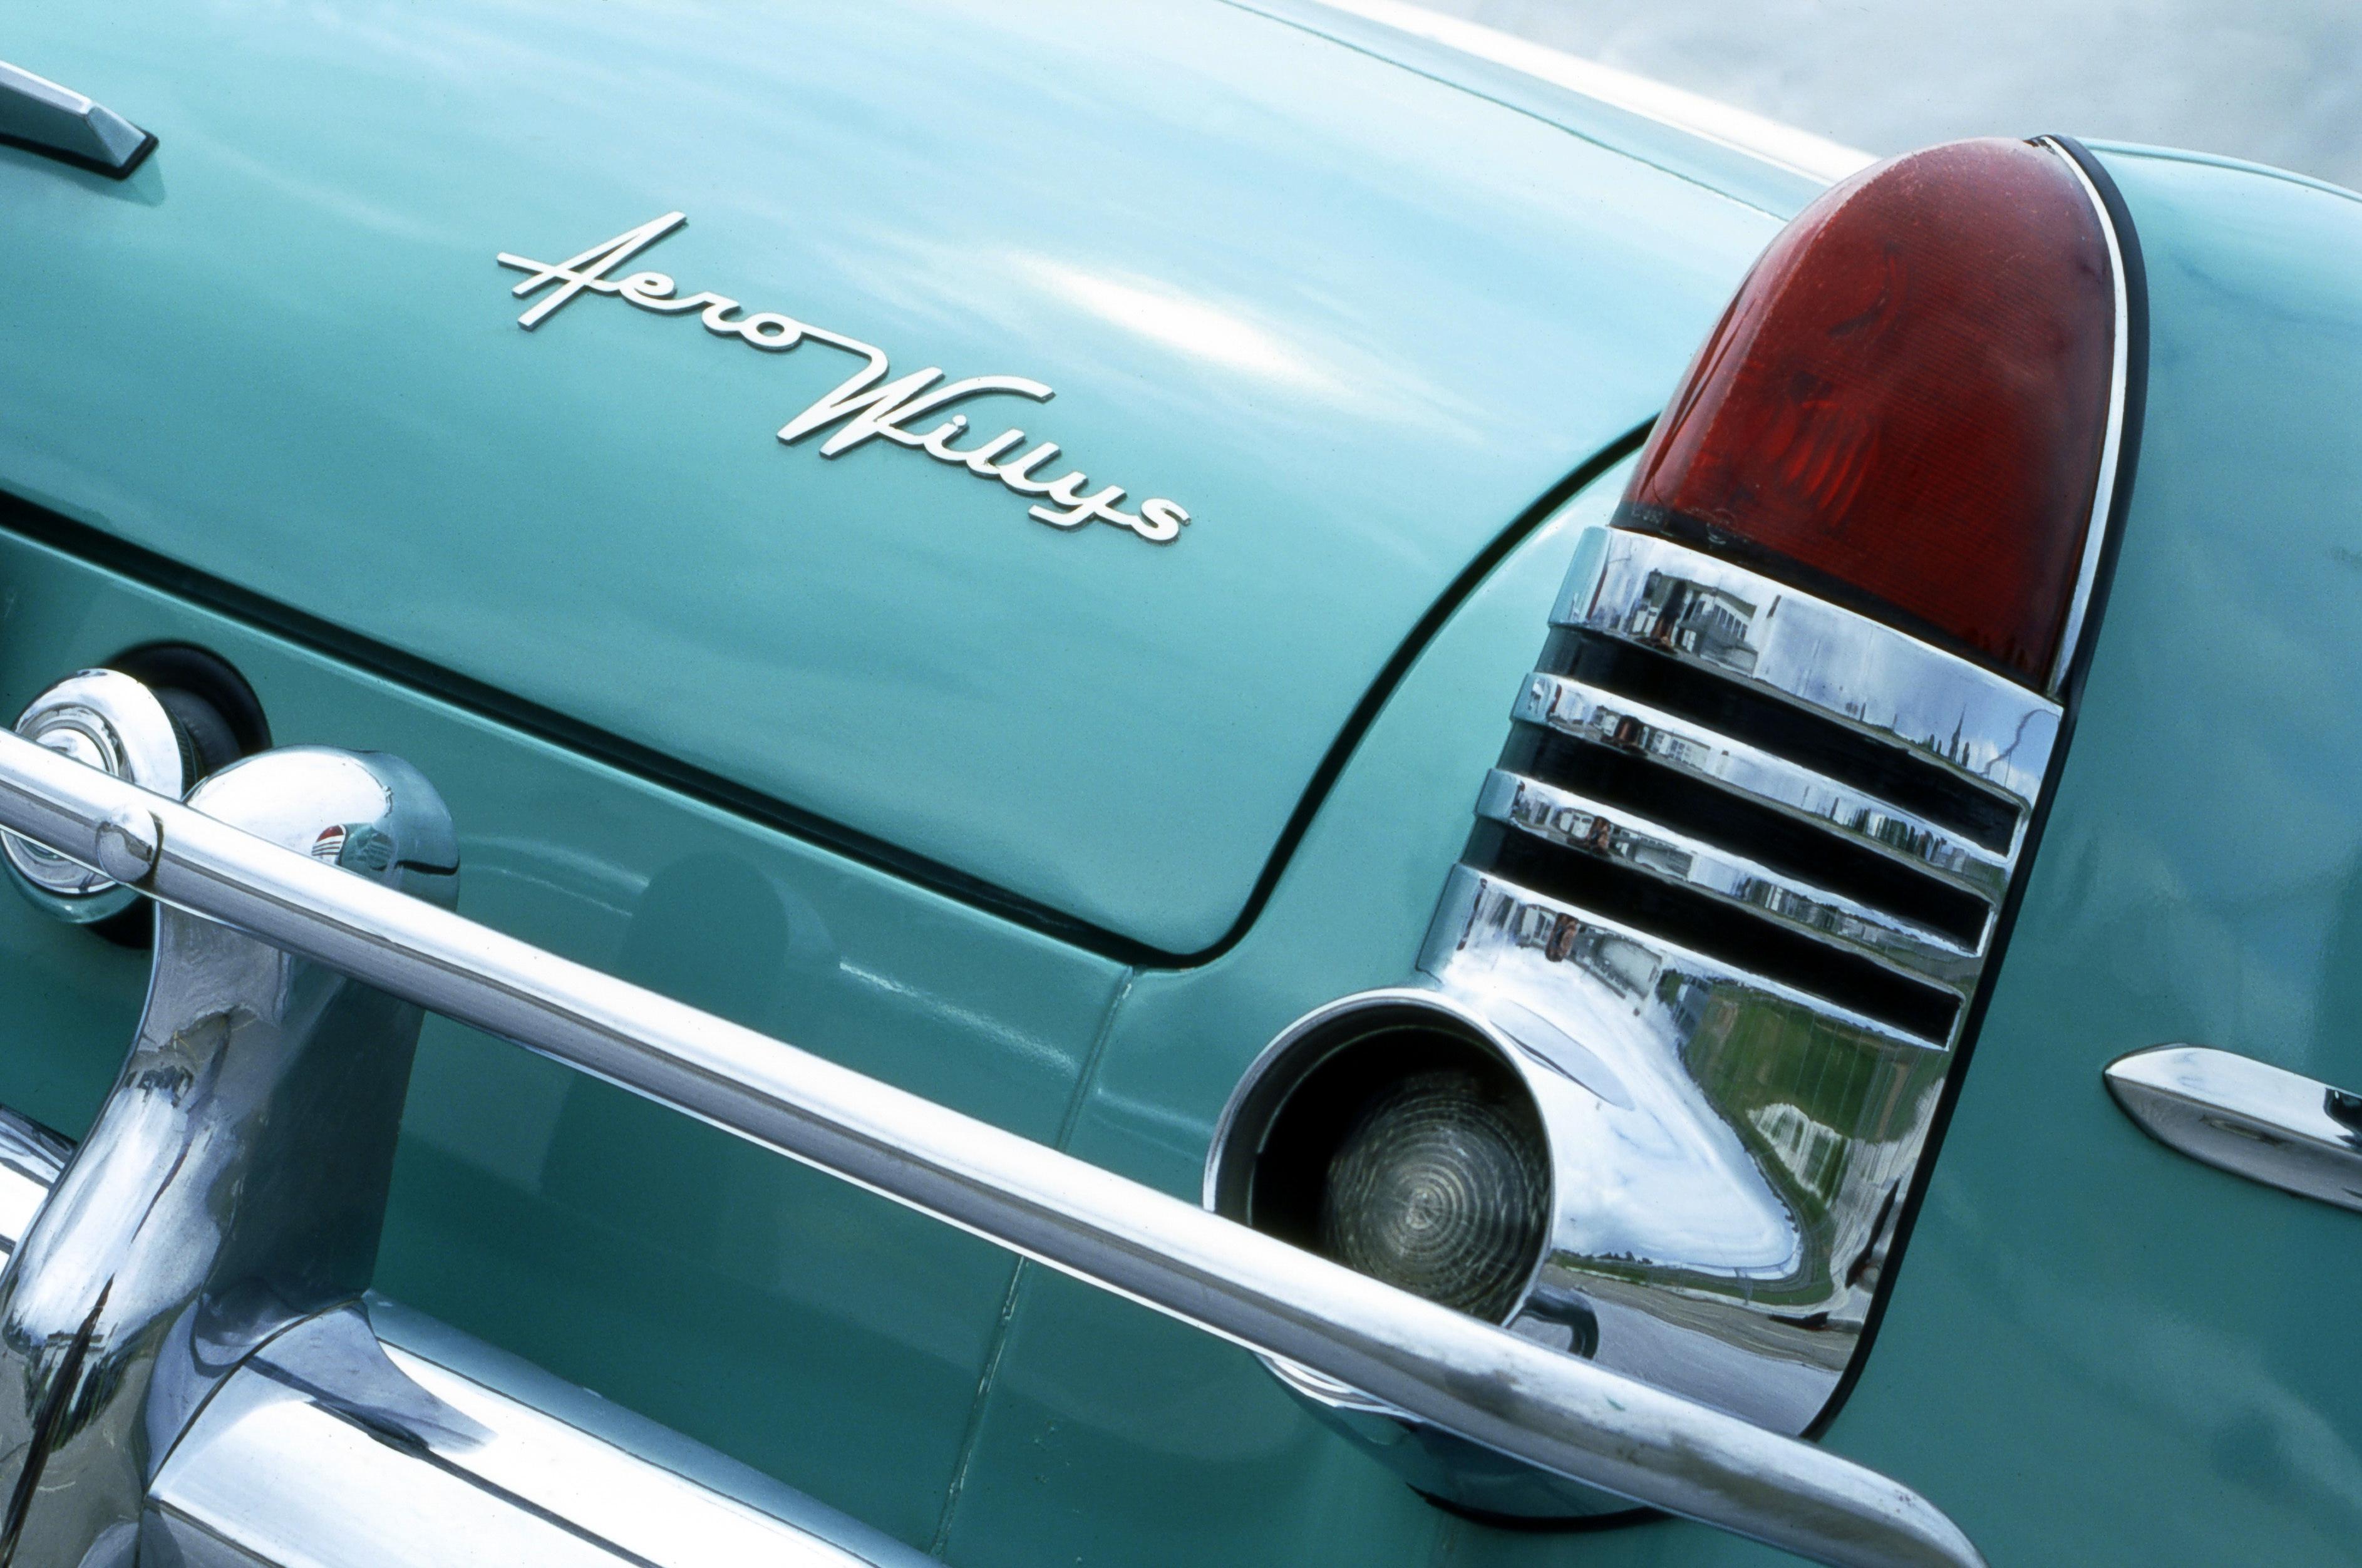 Lanterna-traseira-do-Aero-Willys-2600-da-década-de-60-da-Willys..jpg